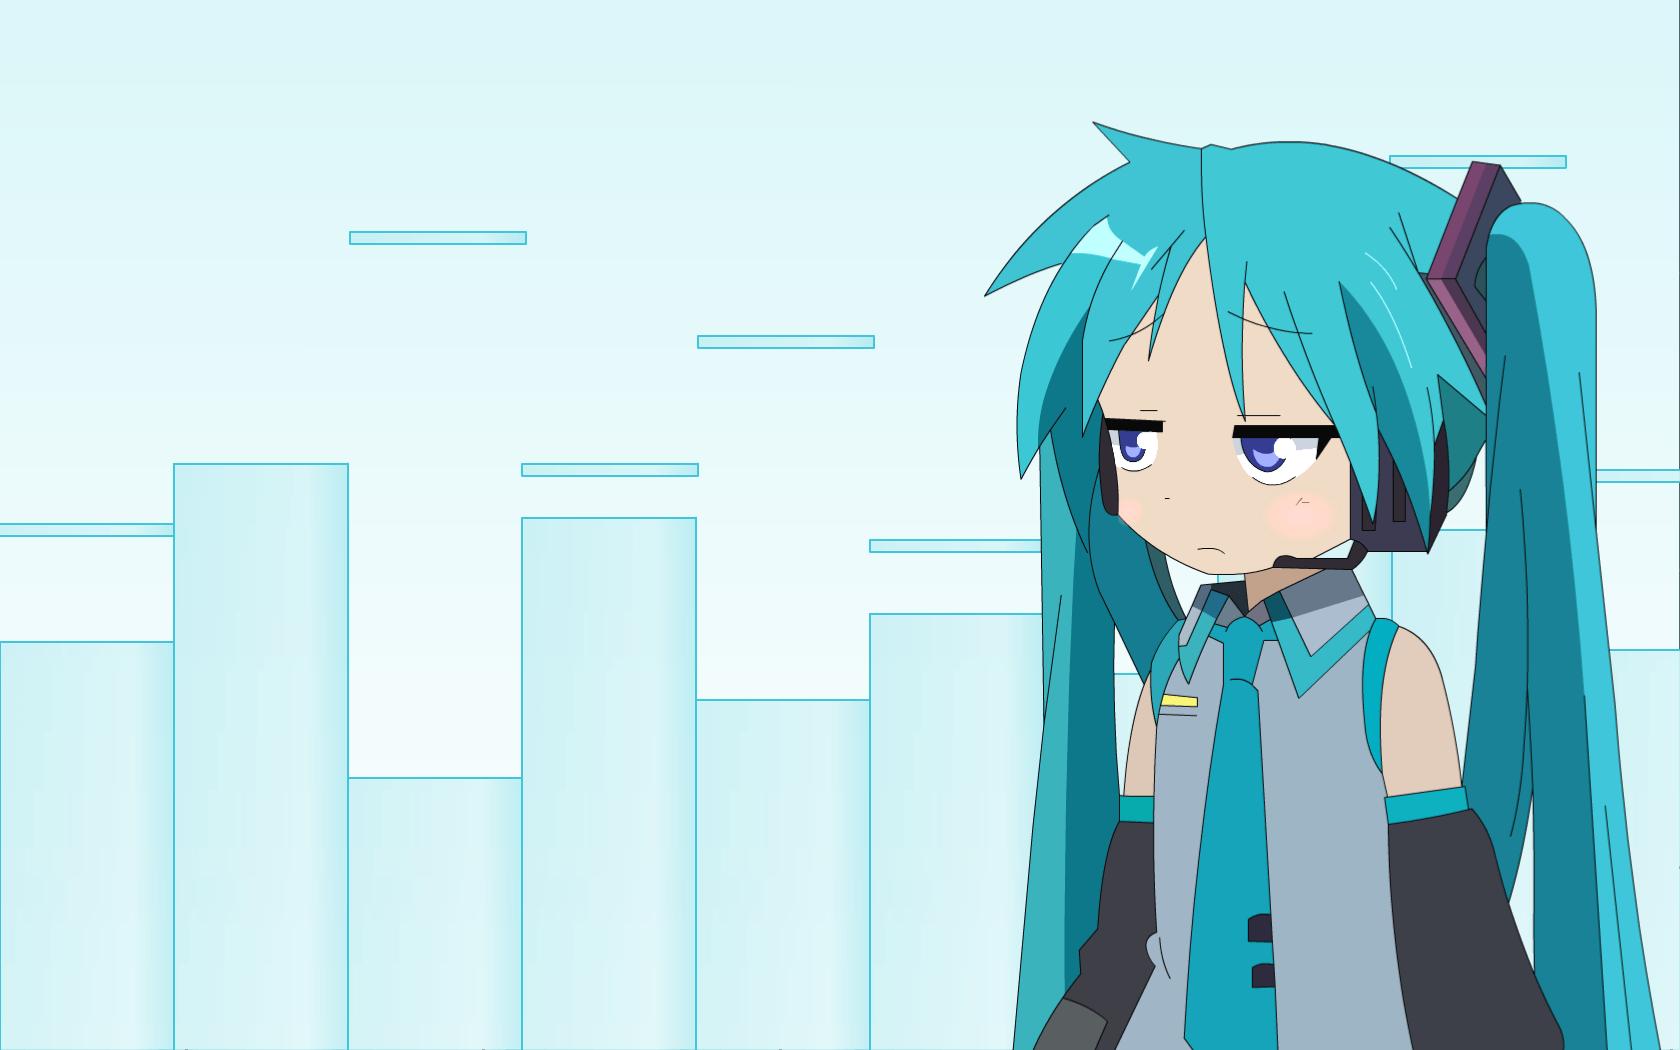 hatsune miku wallpaper android hd